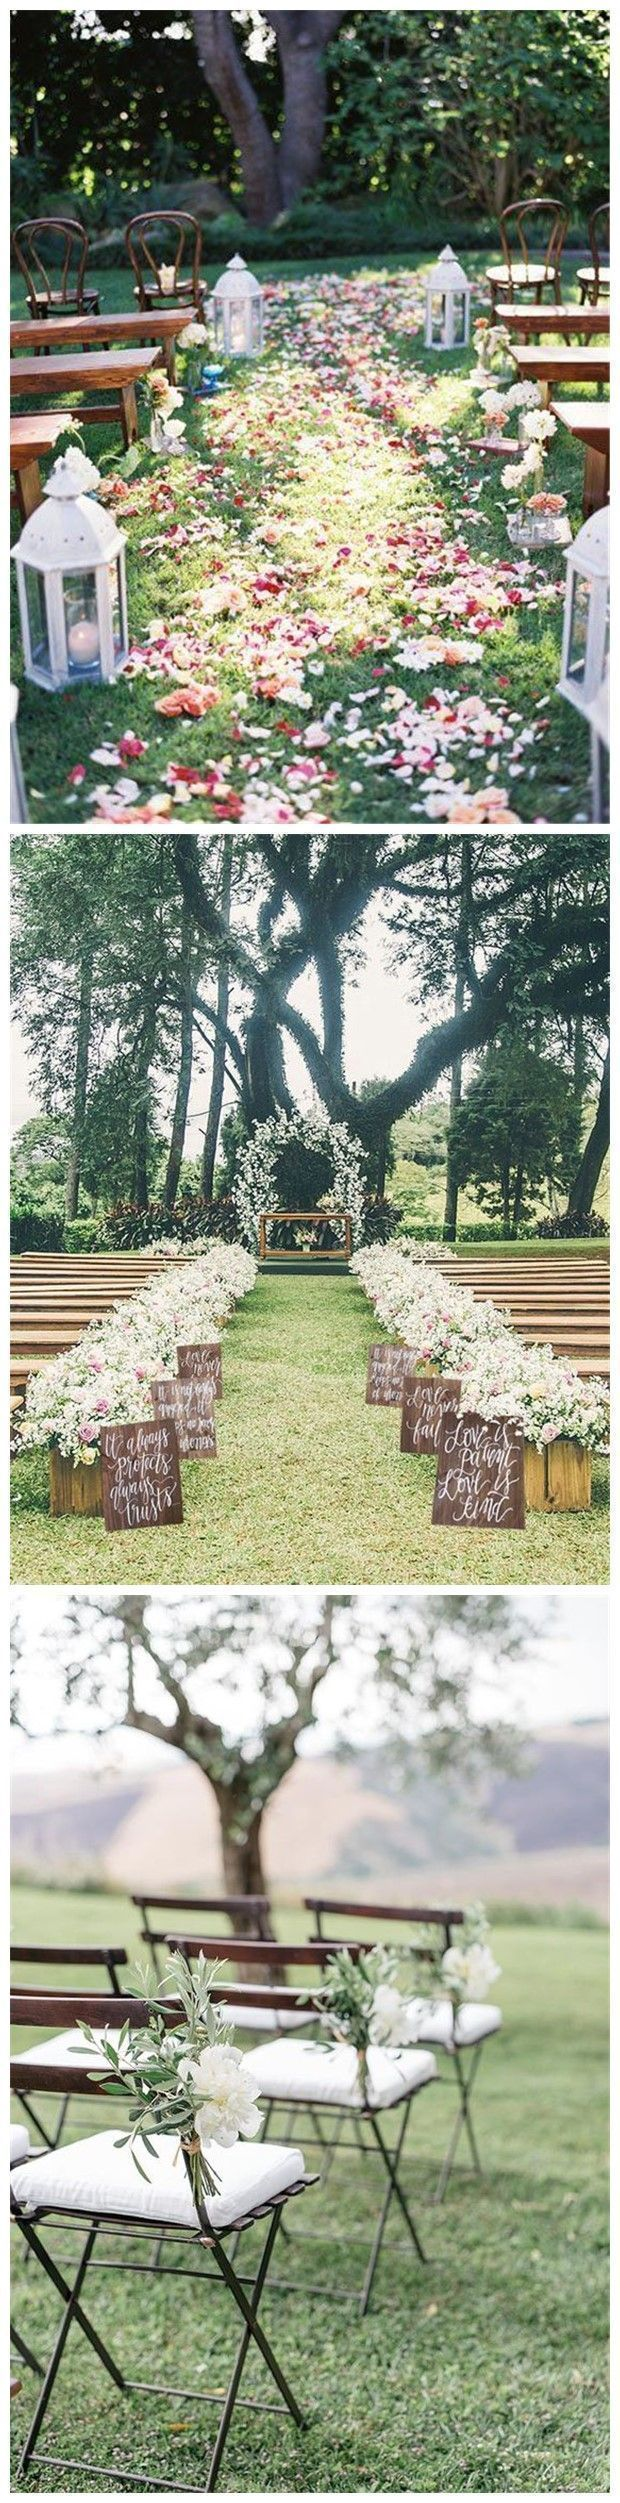 Country Weddings 25 Rustic Outdoor Wedding